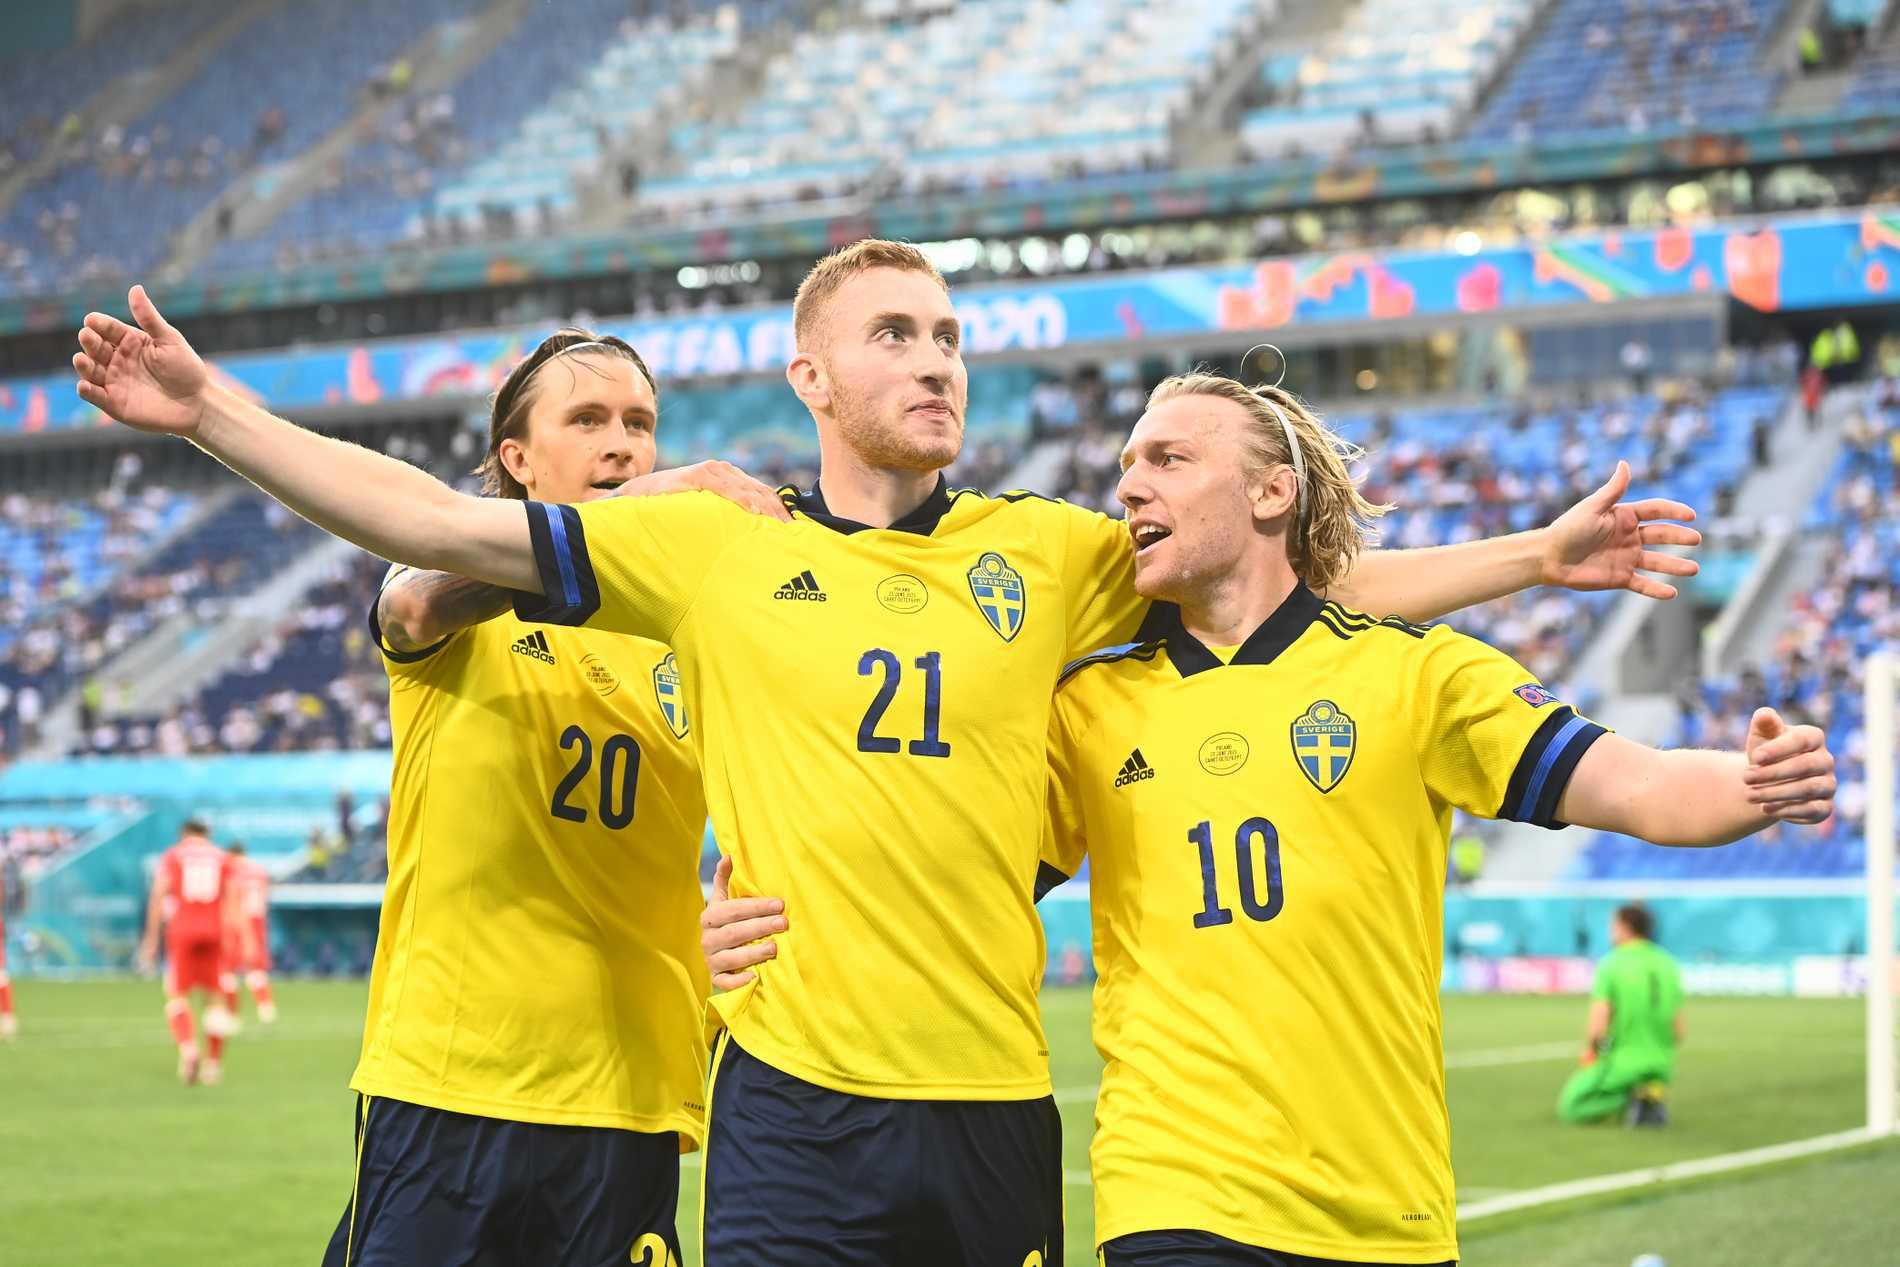 Emil Forsberg gjorde två mål på sin drömarena i S:t Petersburg.